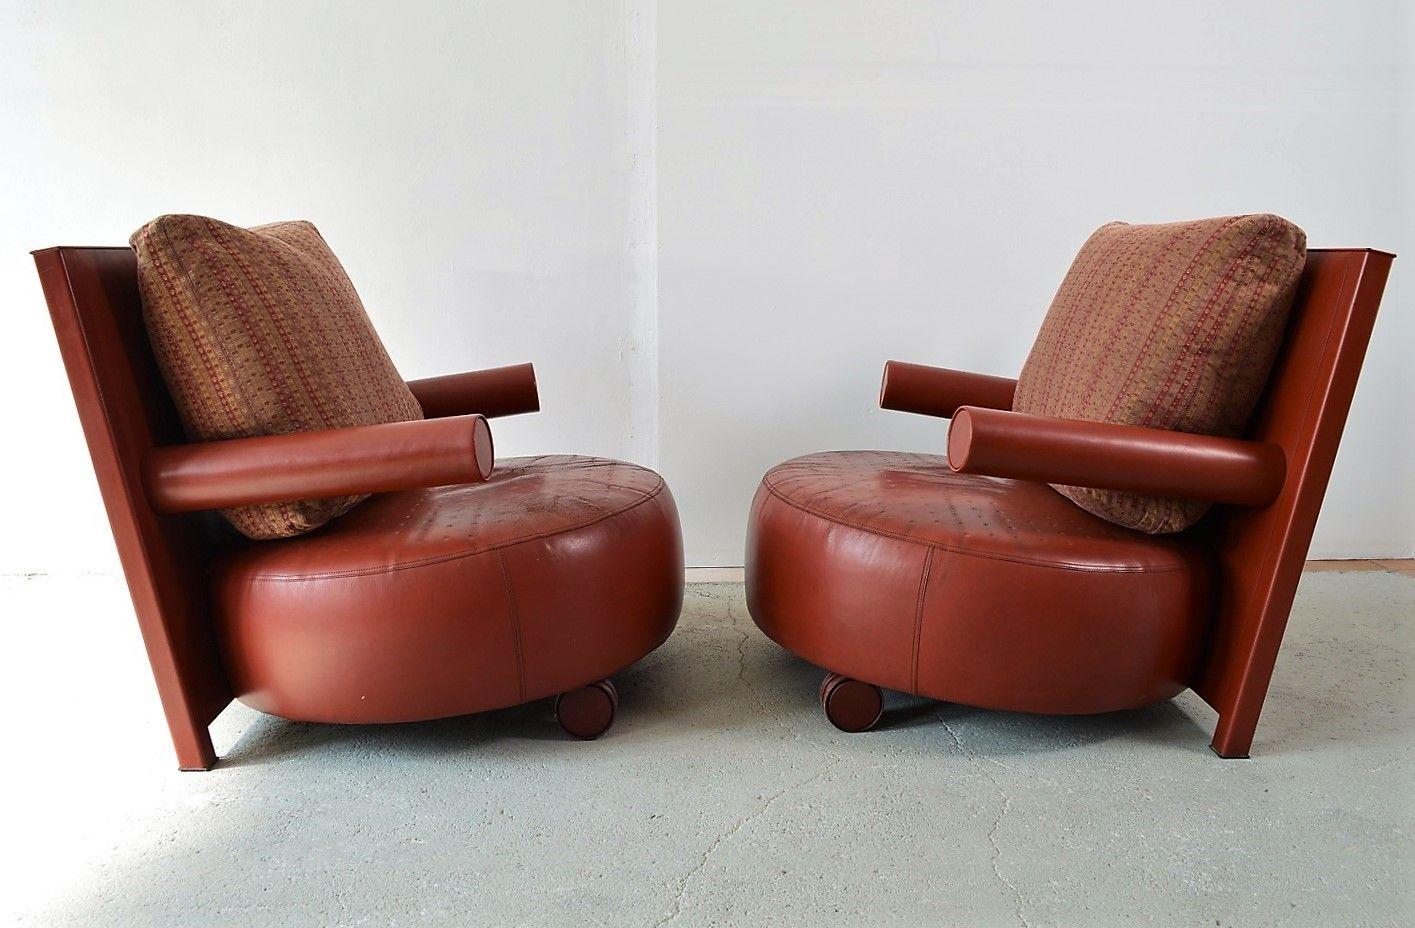 baisity sessel von antonio citterio f r b b italia 1980er bei pamono kaufen. Black Bedroom Furniture Sets. Home Design Ideas